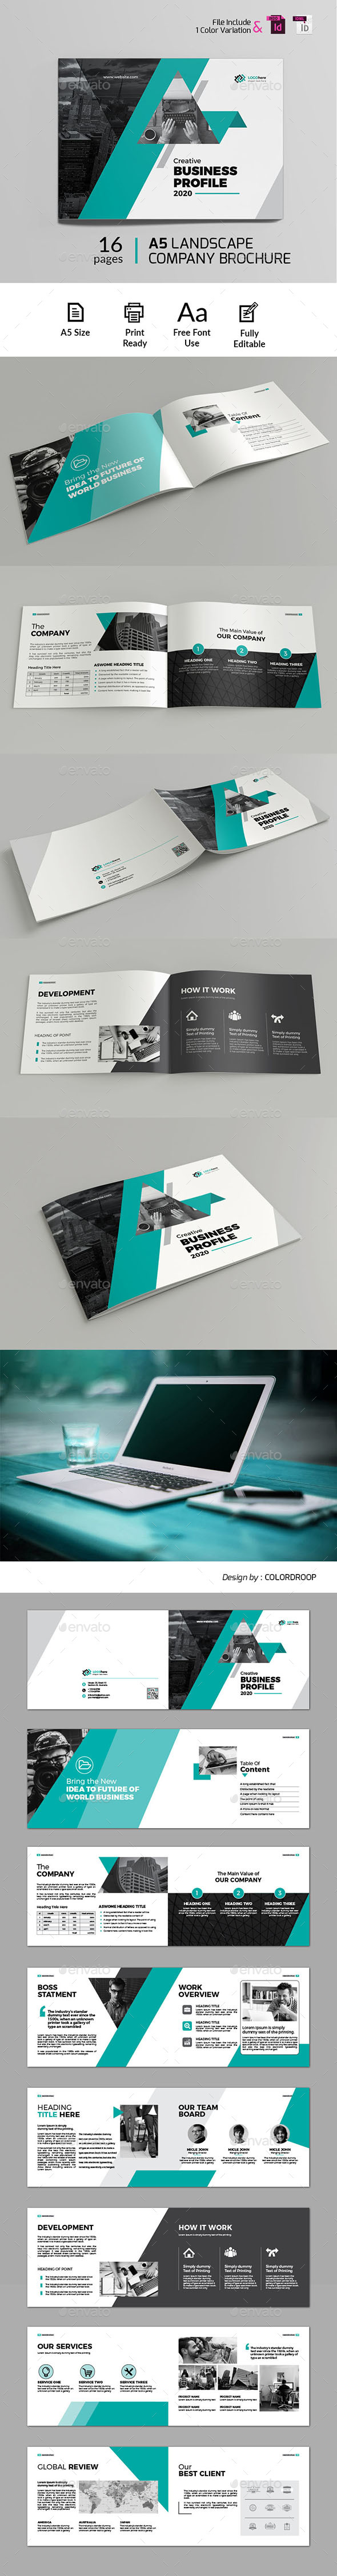 A5 Landscape Company Brochure - Corporate Brochures